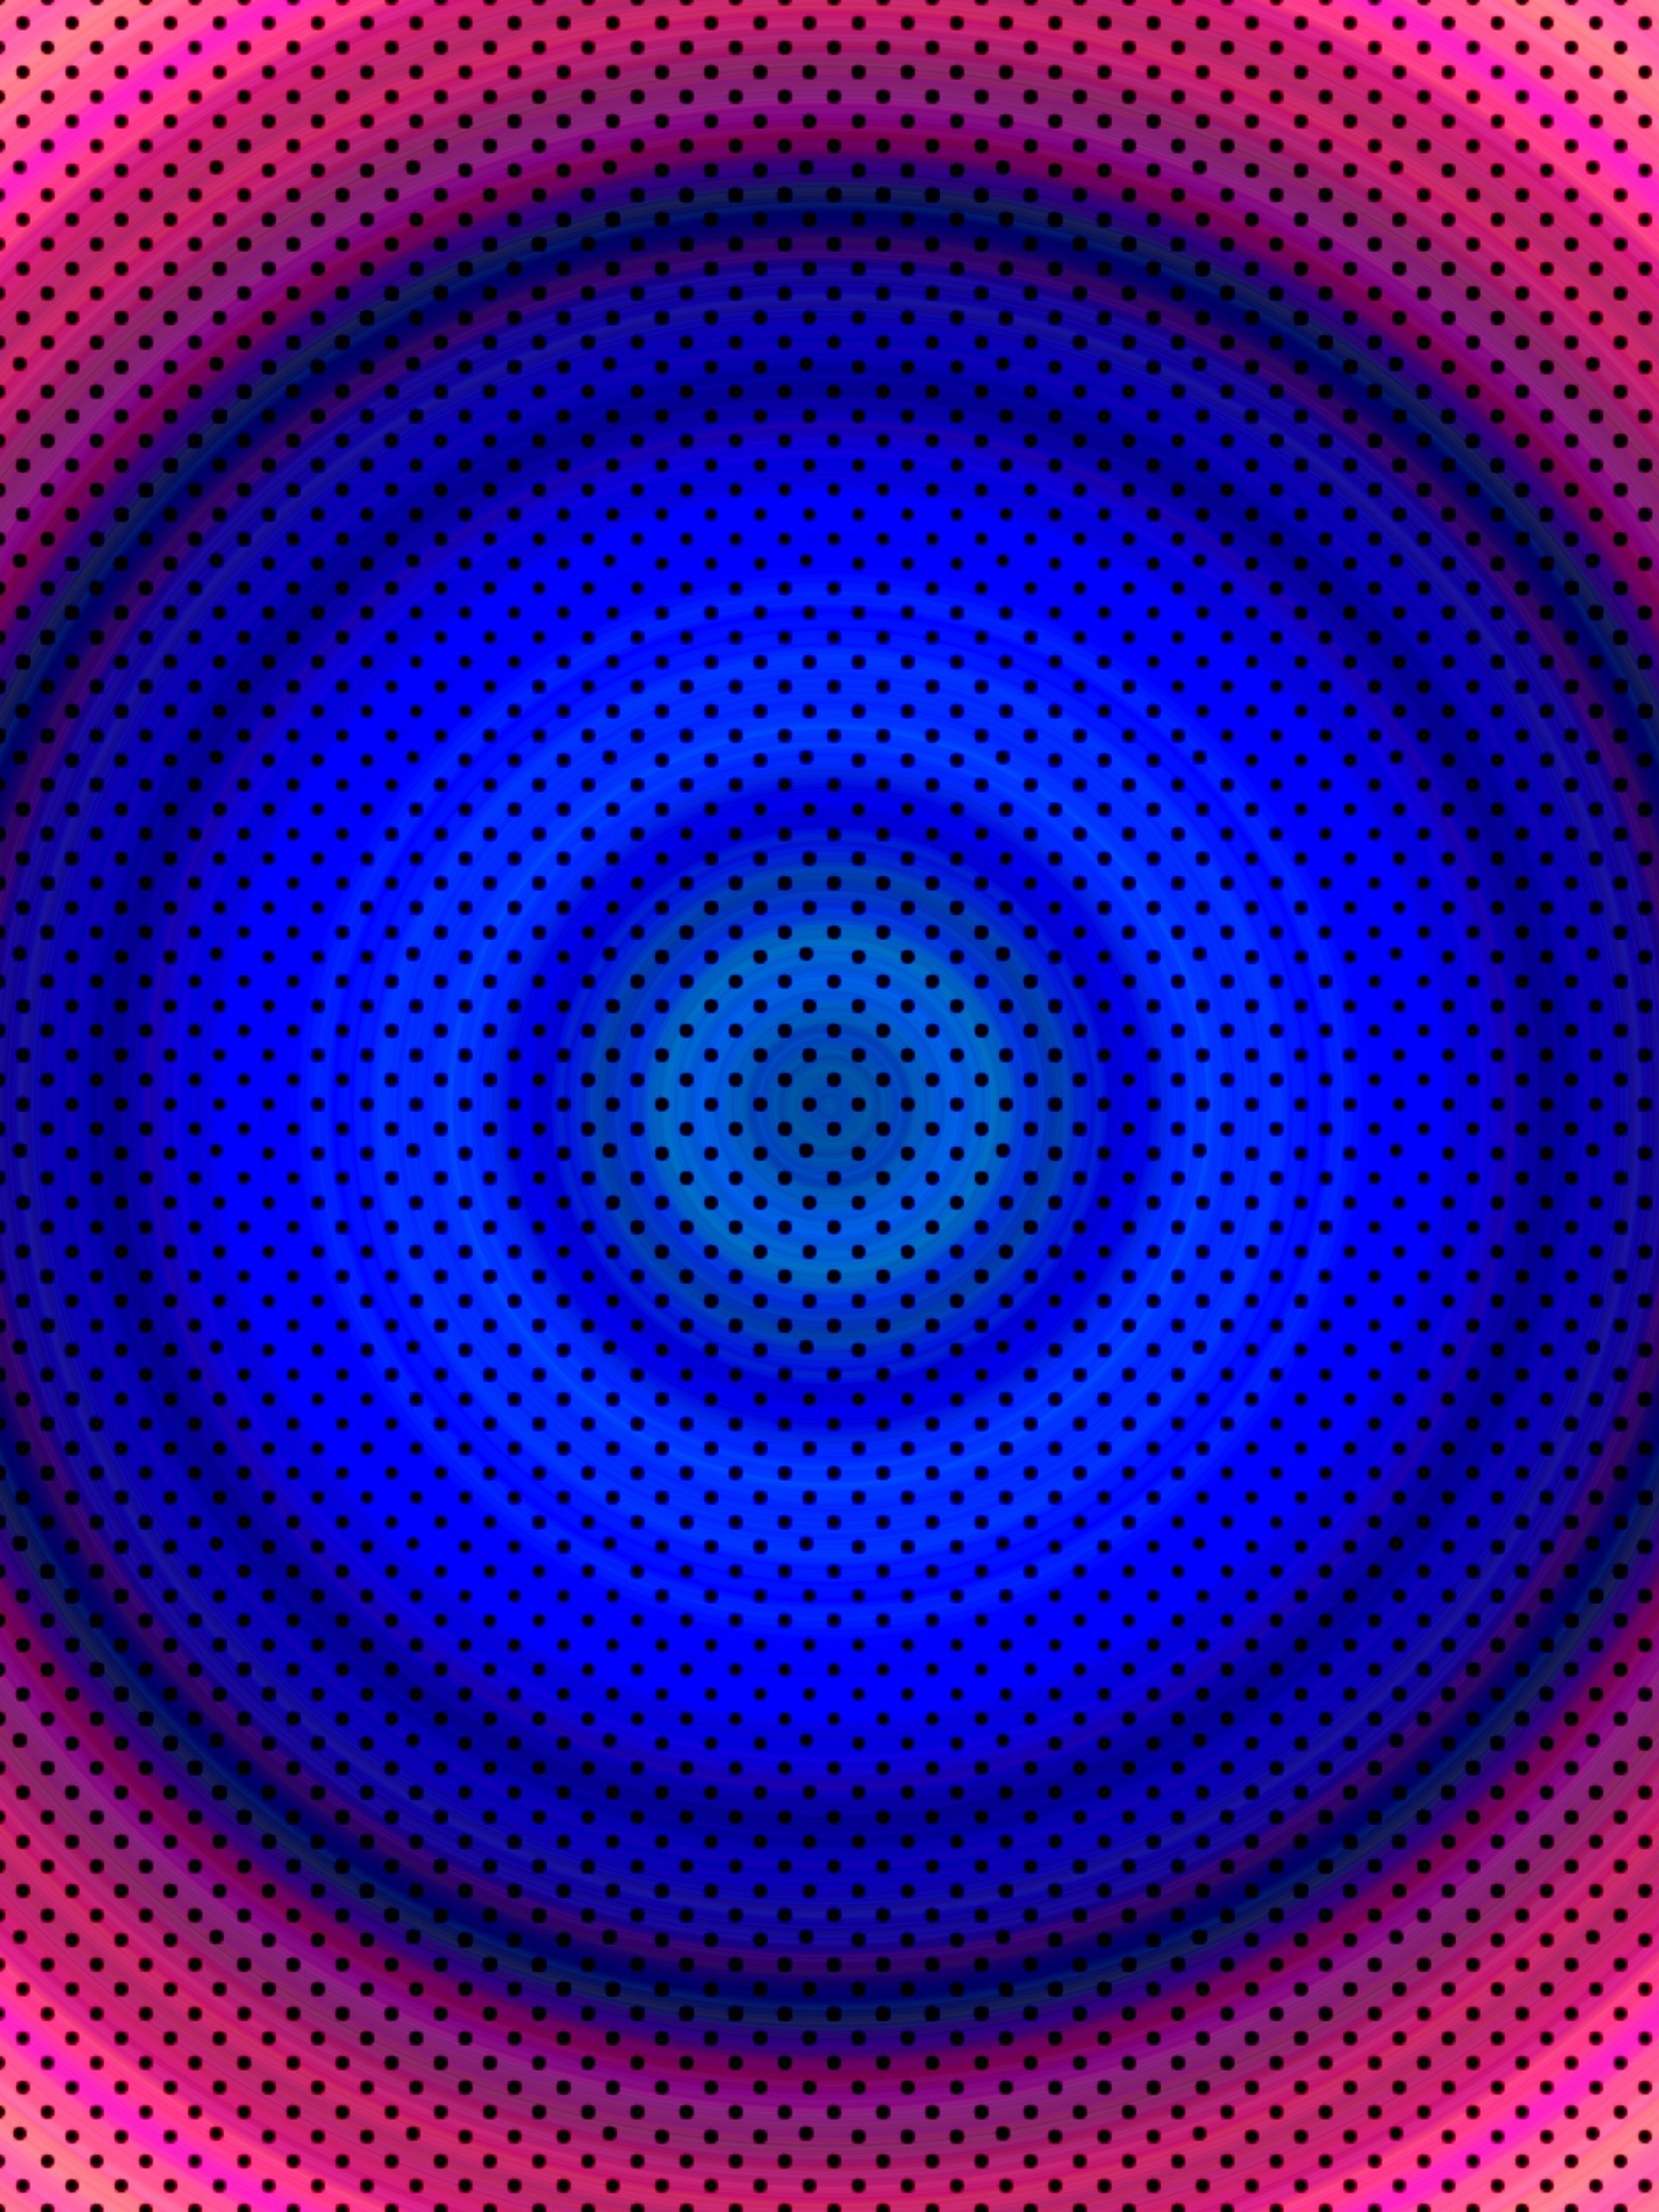 Dotted circular design